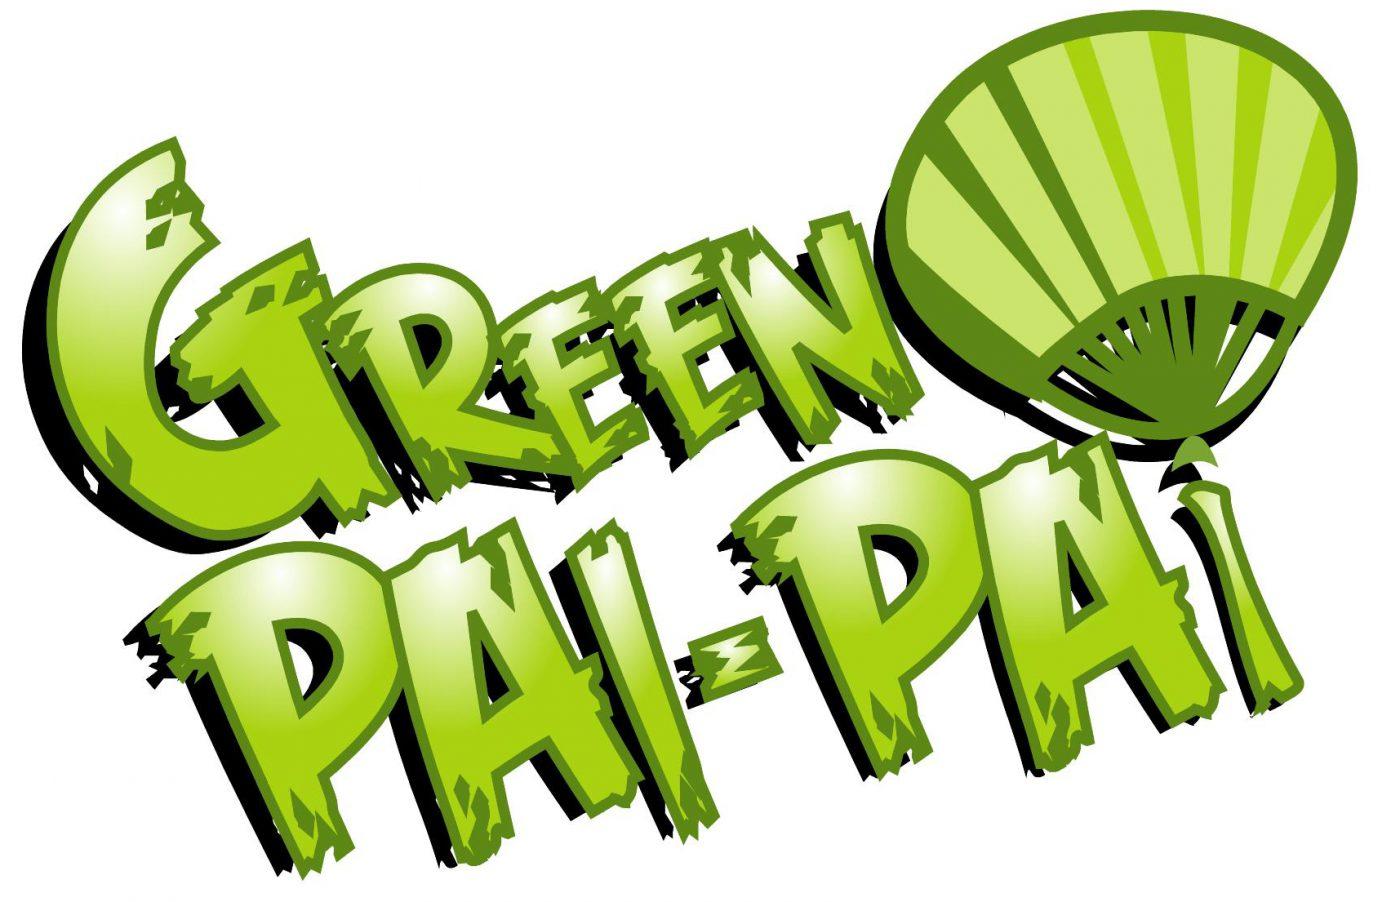 Green Pai-Pai